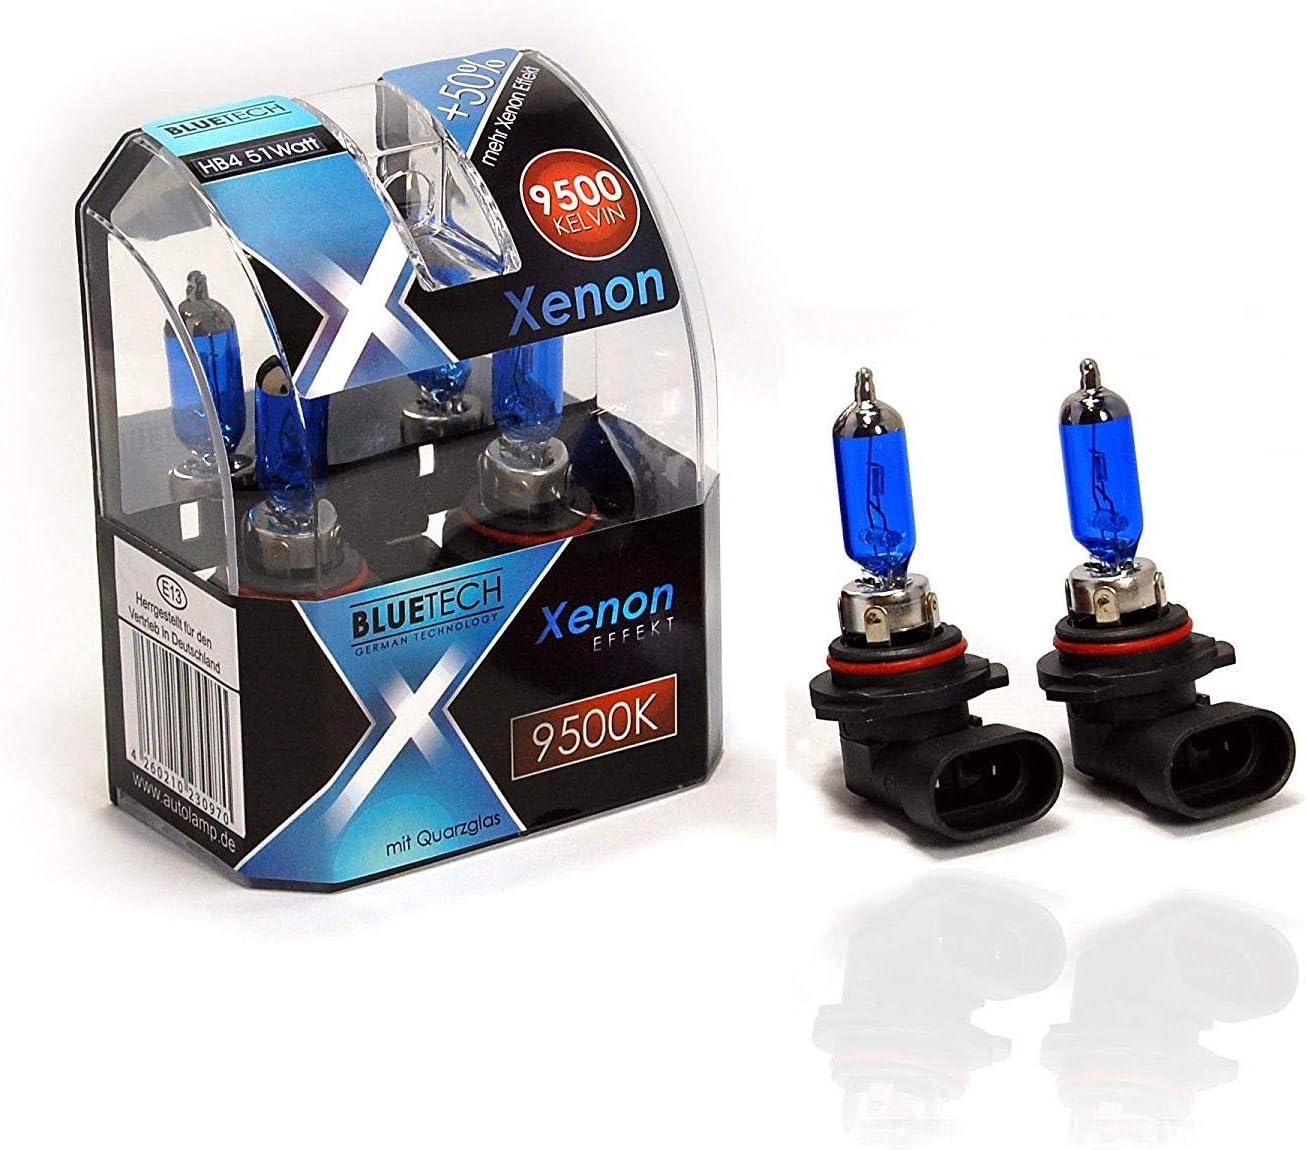 Bluetech Hb4 51w 9500k Xenon Effekt 2er Set Mit Stvzo Zulassung Auto